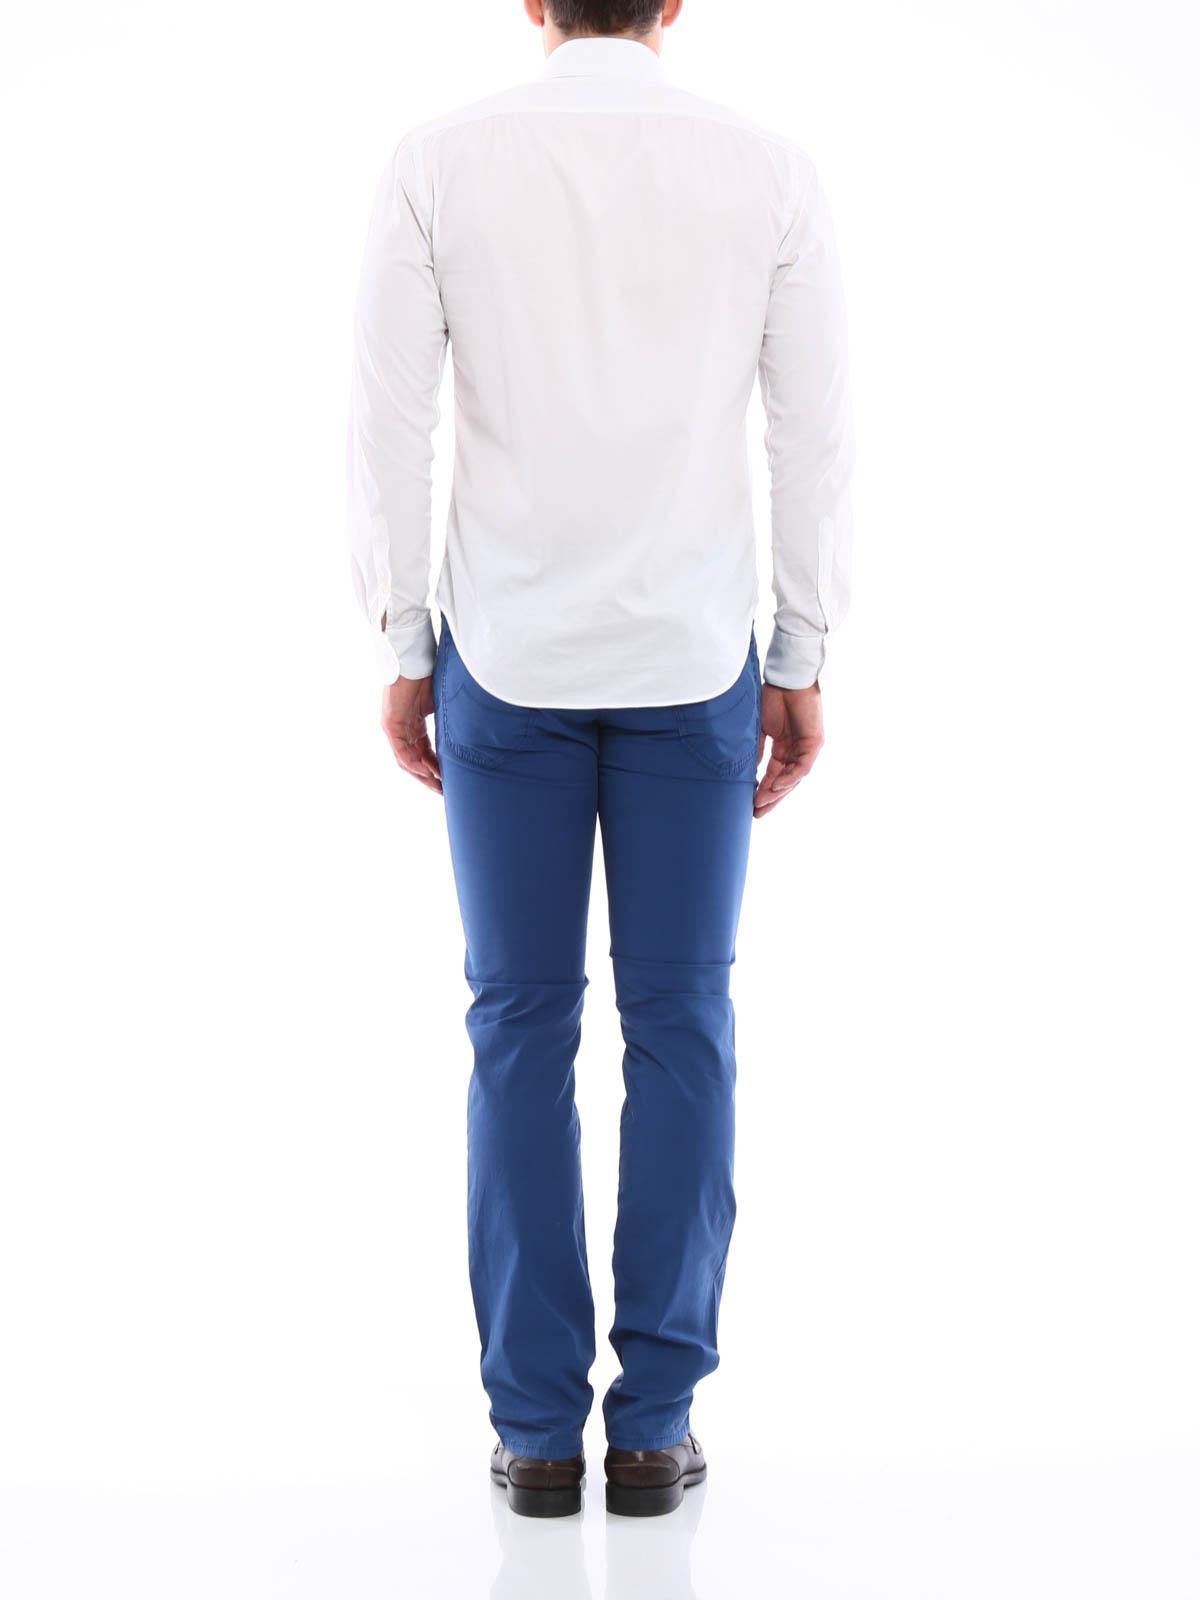 jeans sartoriali jacob cohen pantaloni casual ikrix. Black Bedroom Furniture Sets. Home Design Ideas